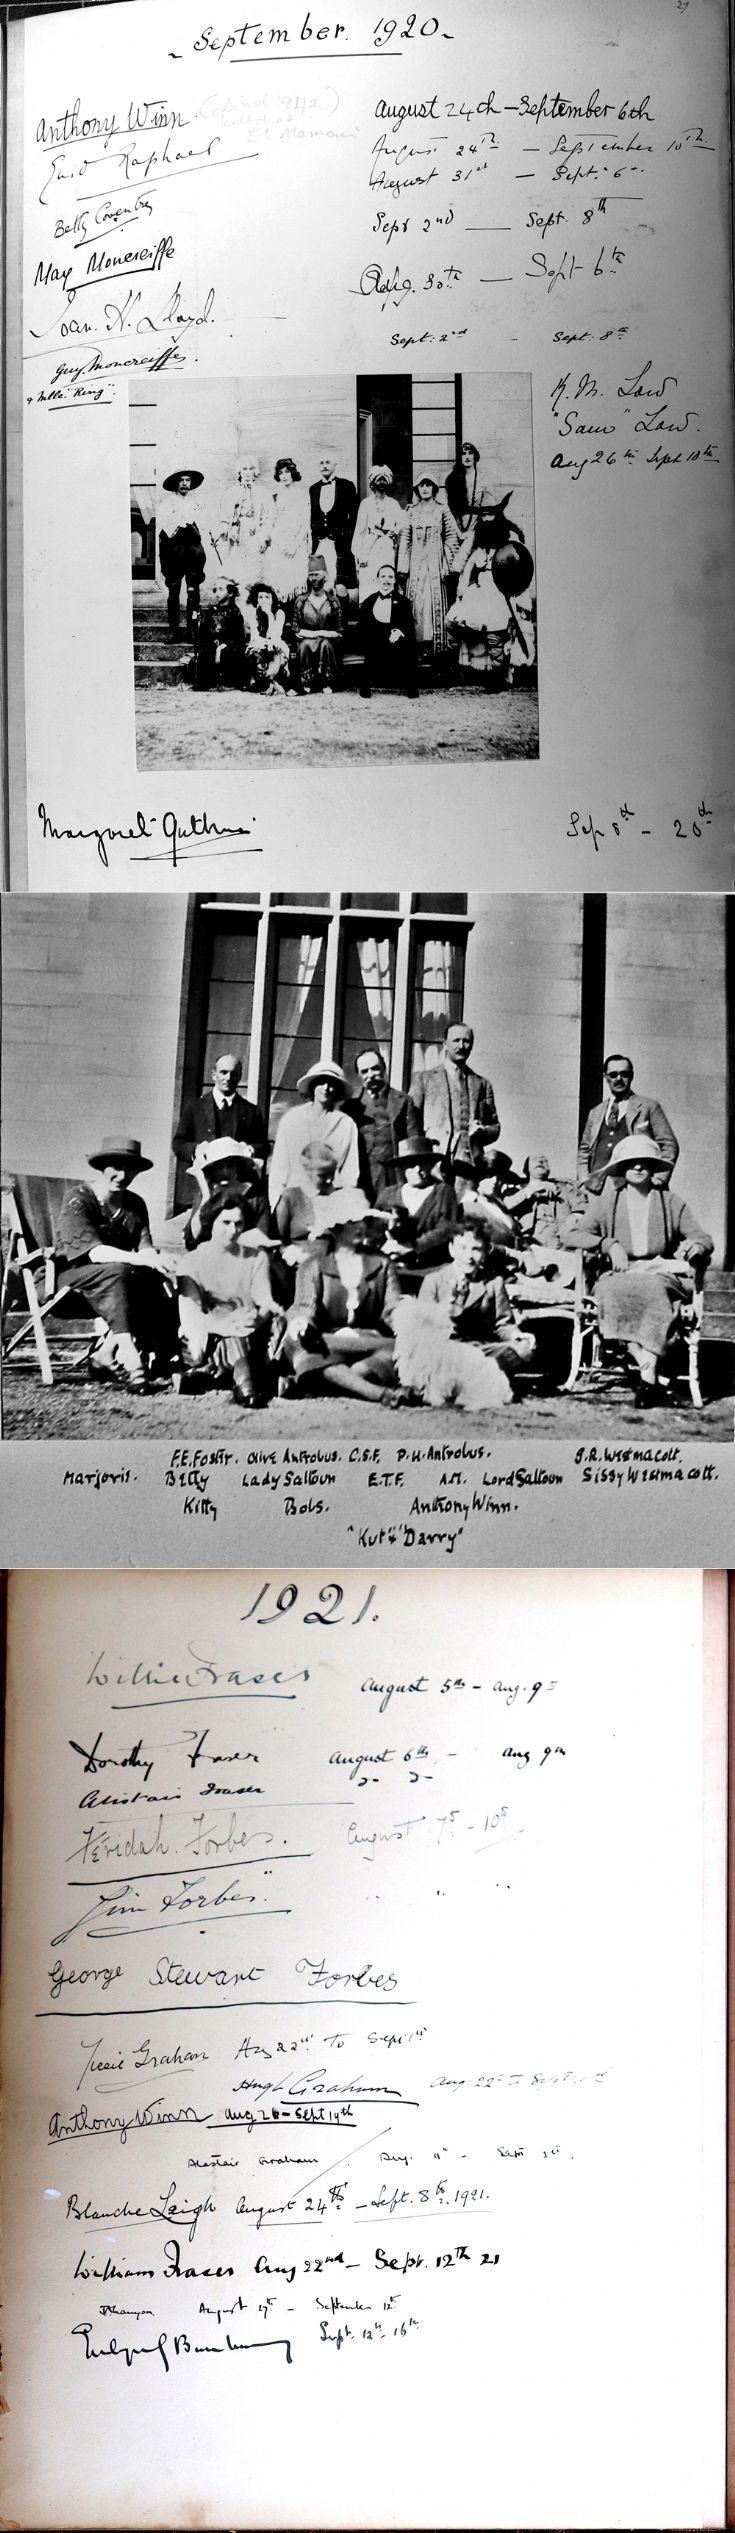 47 Castle Newe Visitors Book 1920